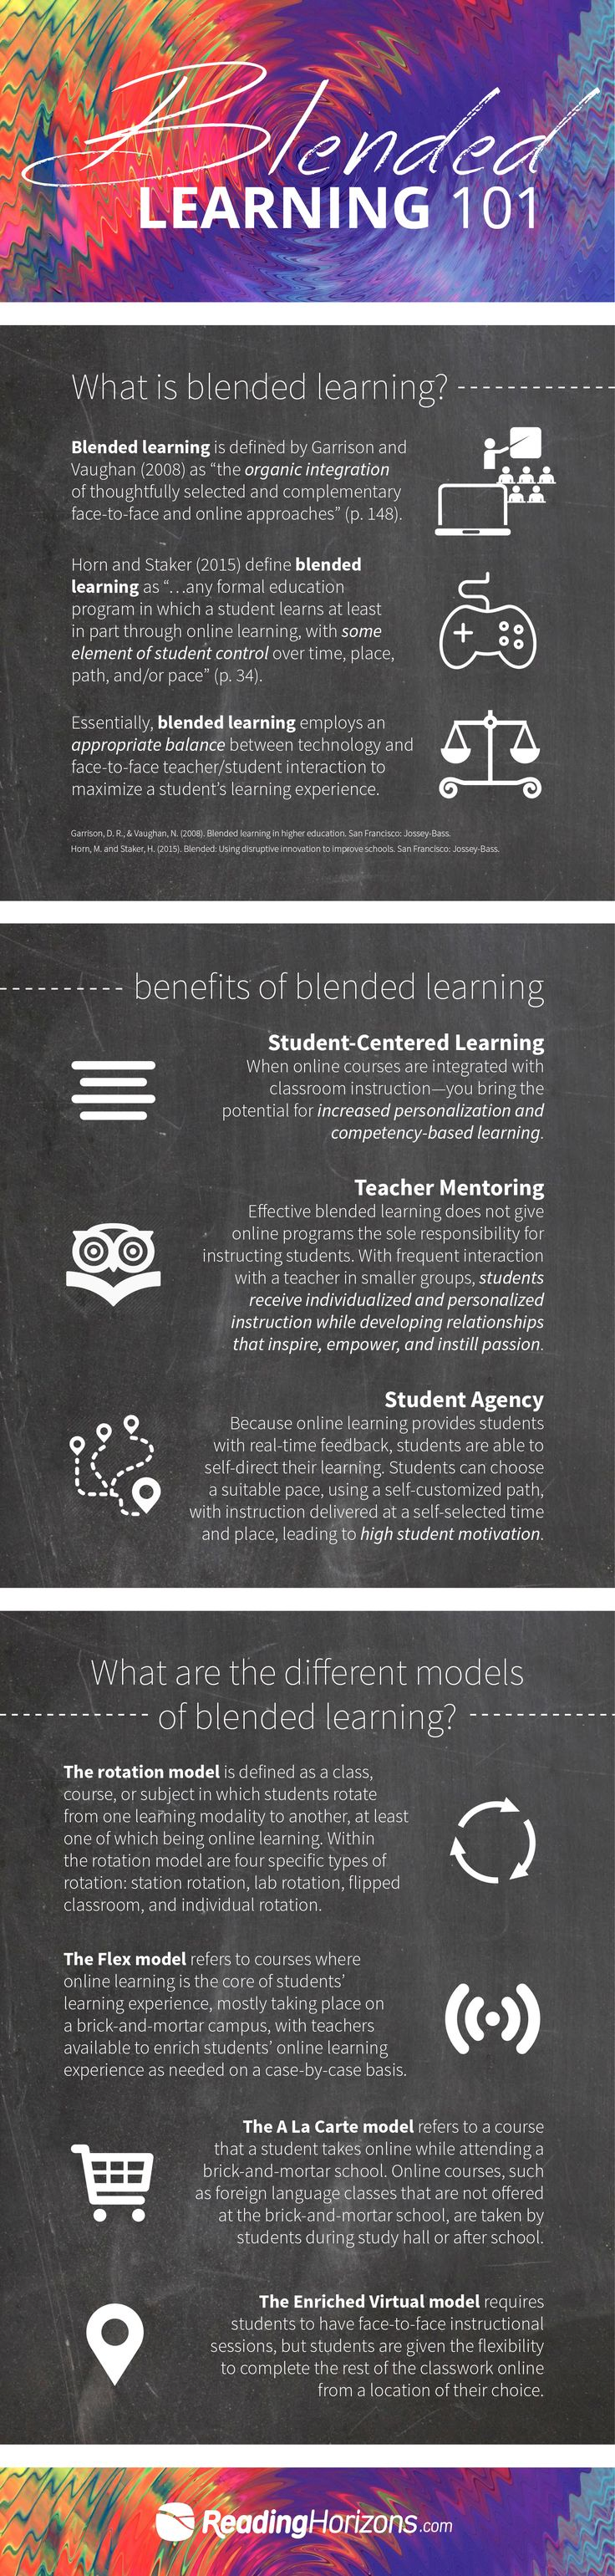 Blended Learning 101 Infographic - http://elearninginfographics.com/blended-learning-101-infographic/